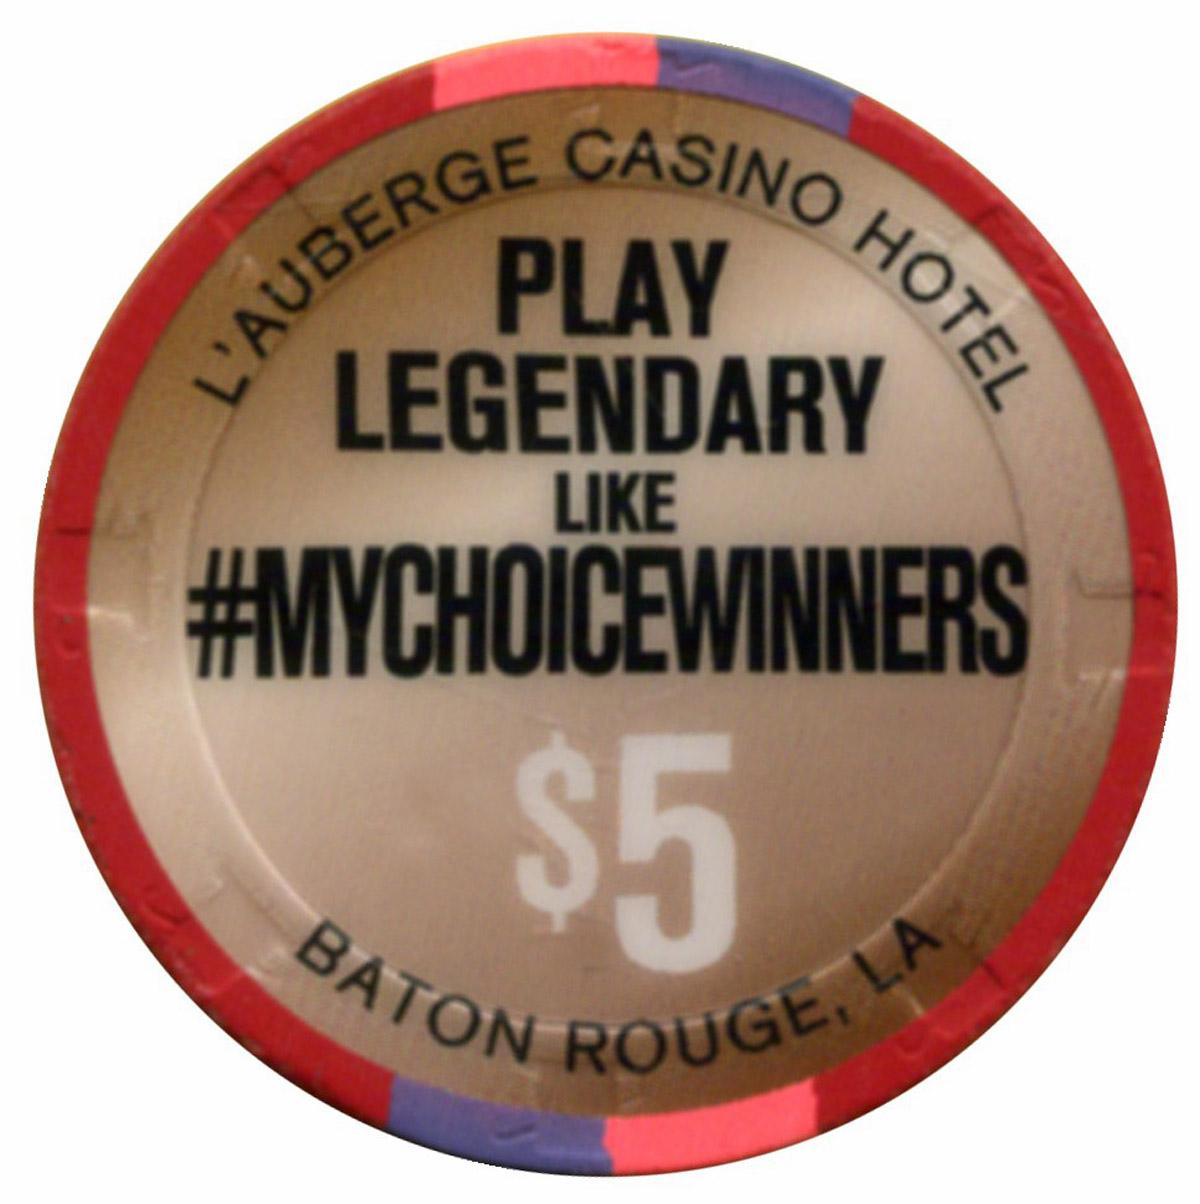 Club Rouge Online Casino